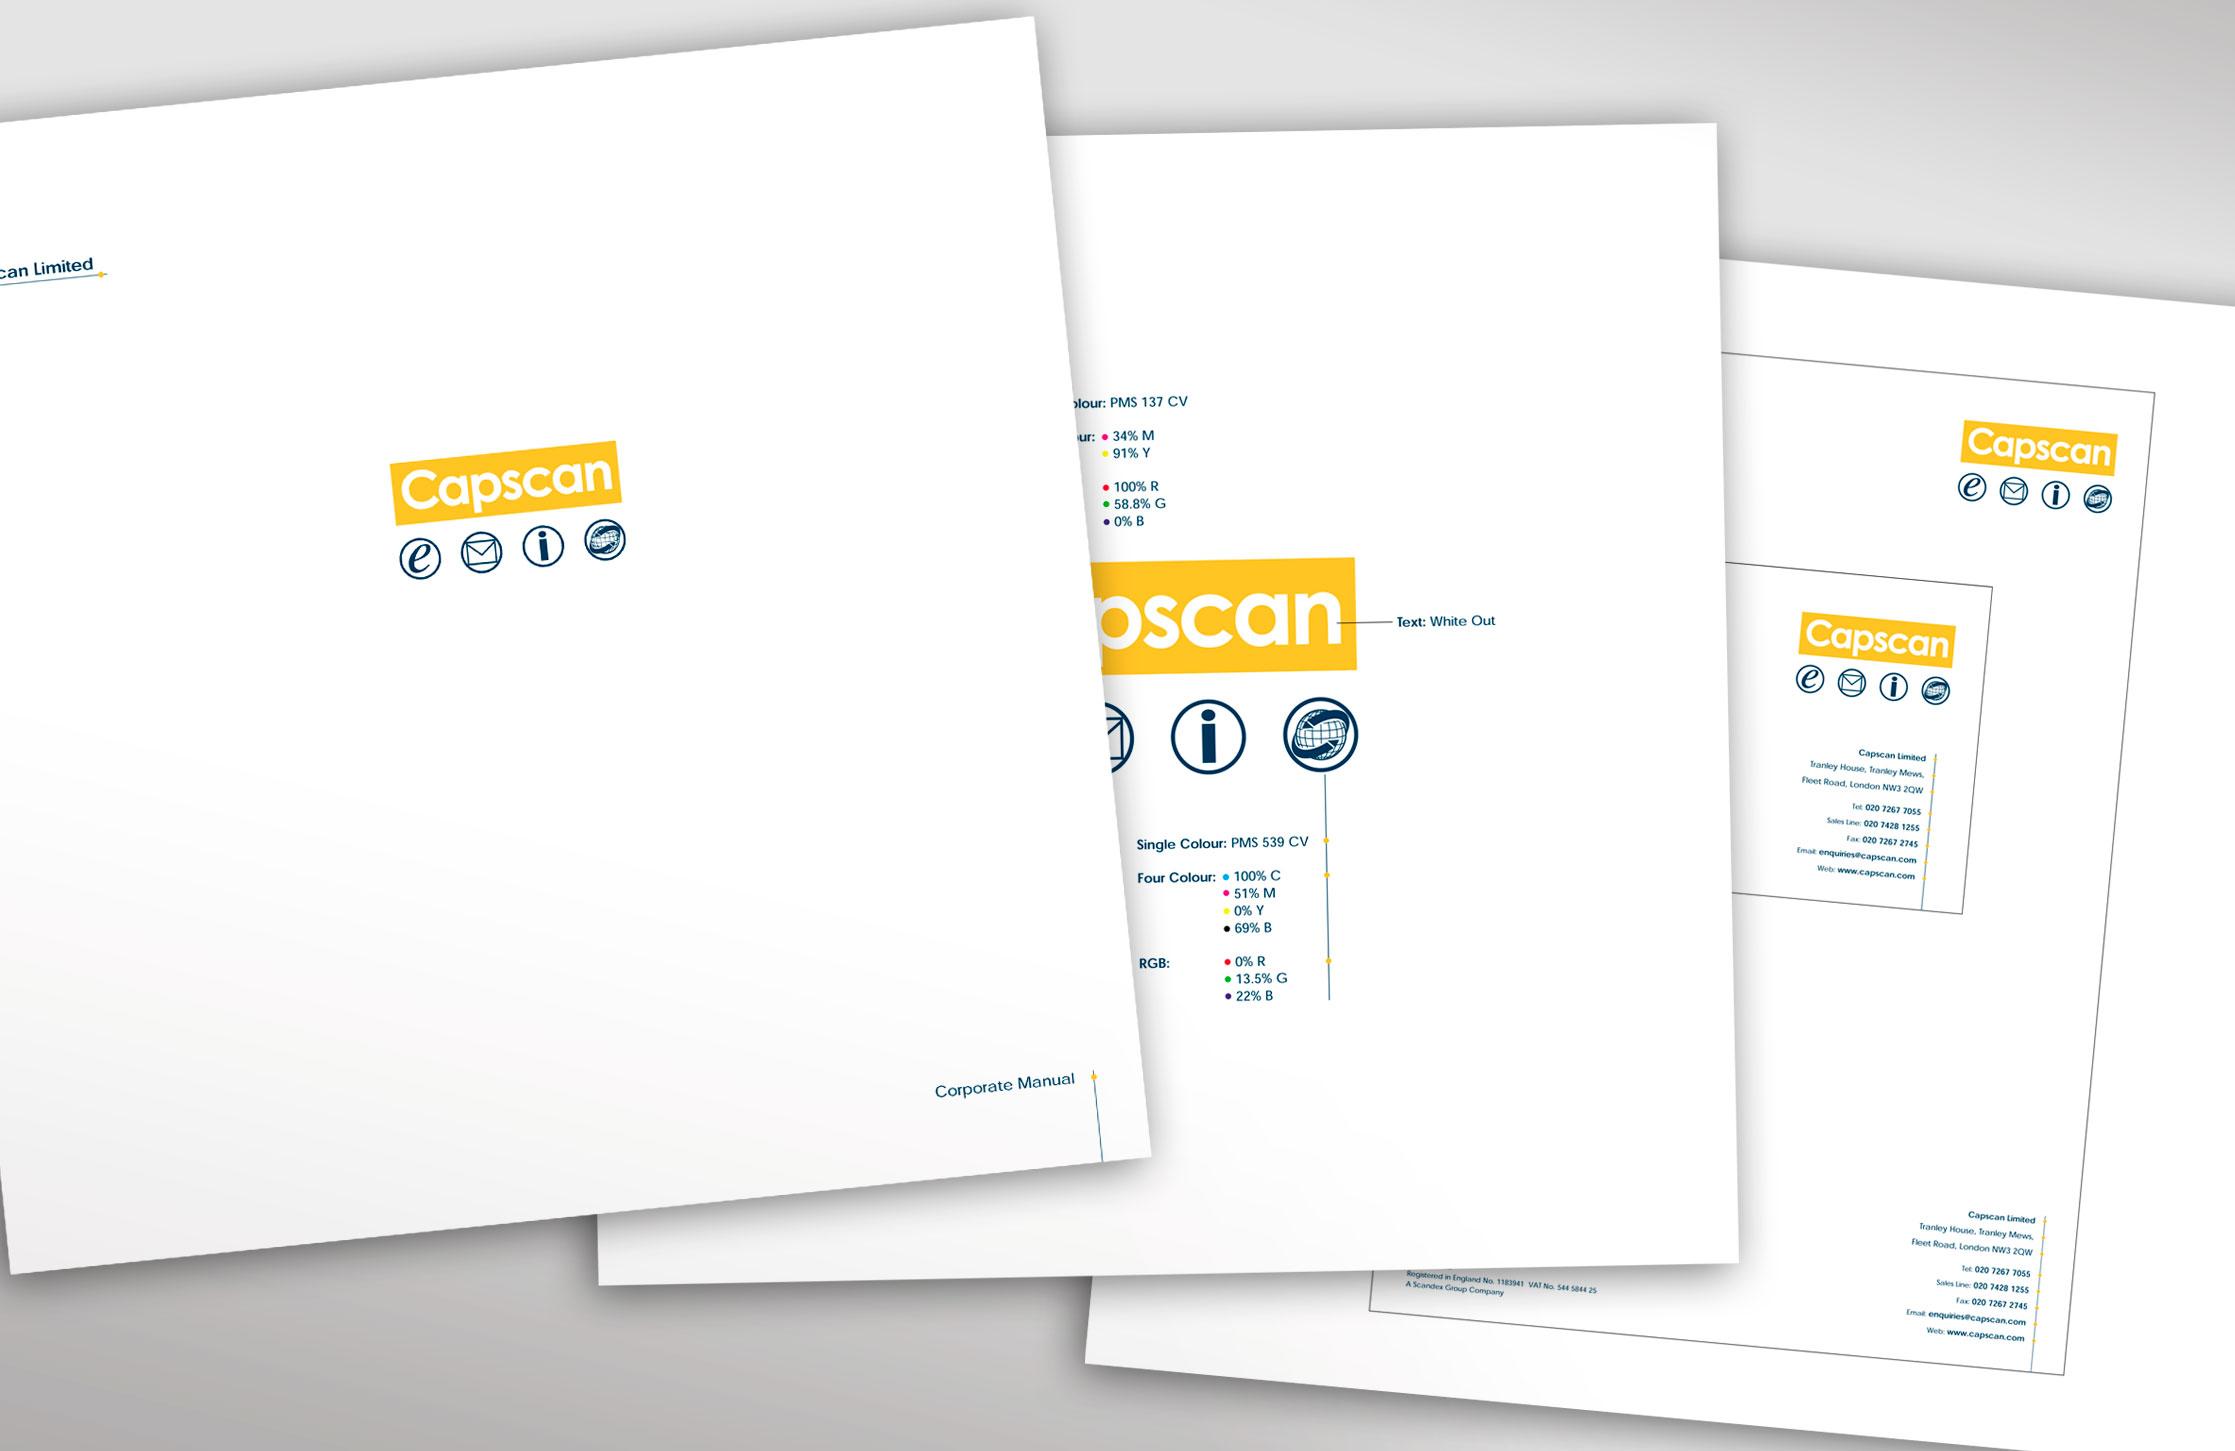 Capscan Corporate Manual